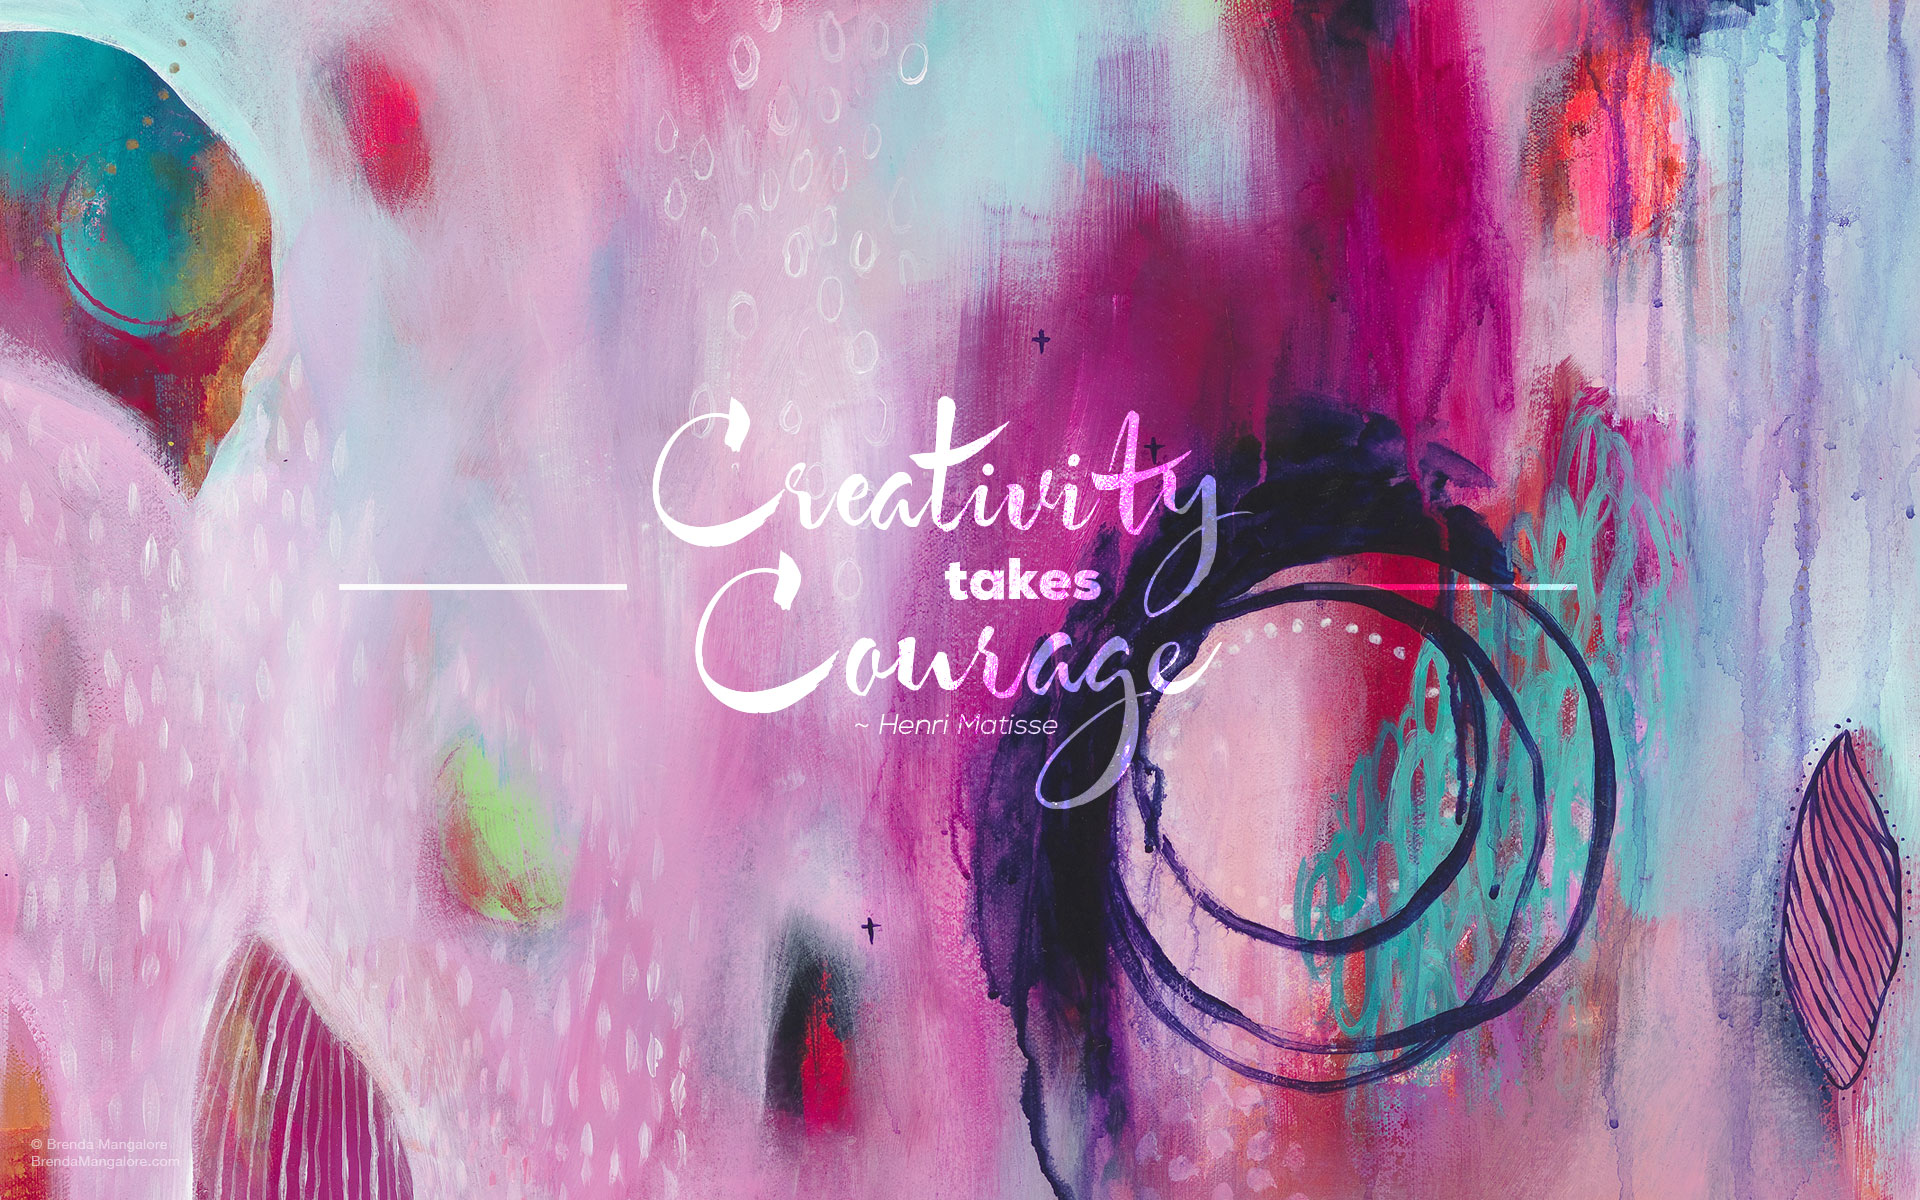 JAN2016_CreativityCourage_1920x1200.jpg